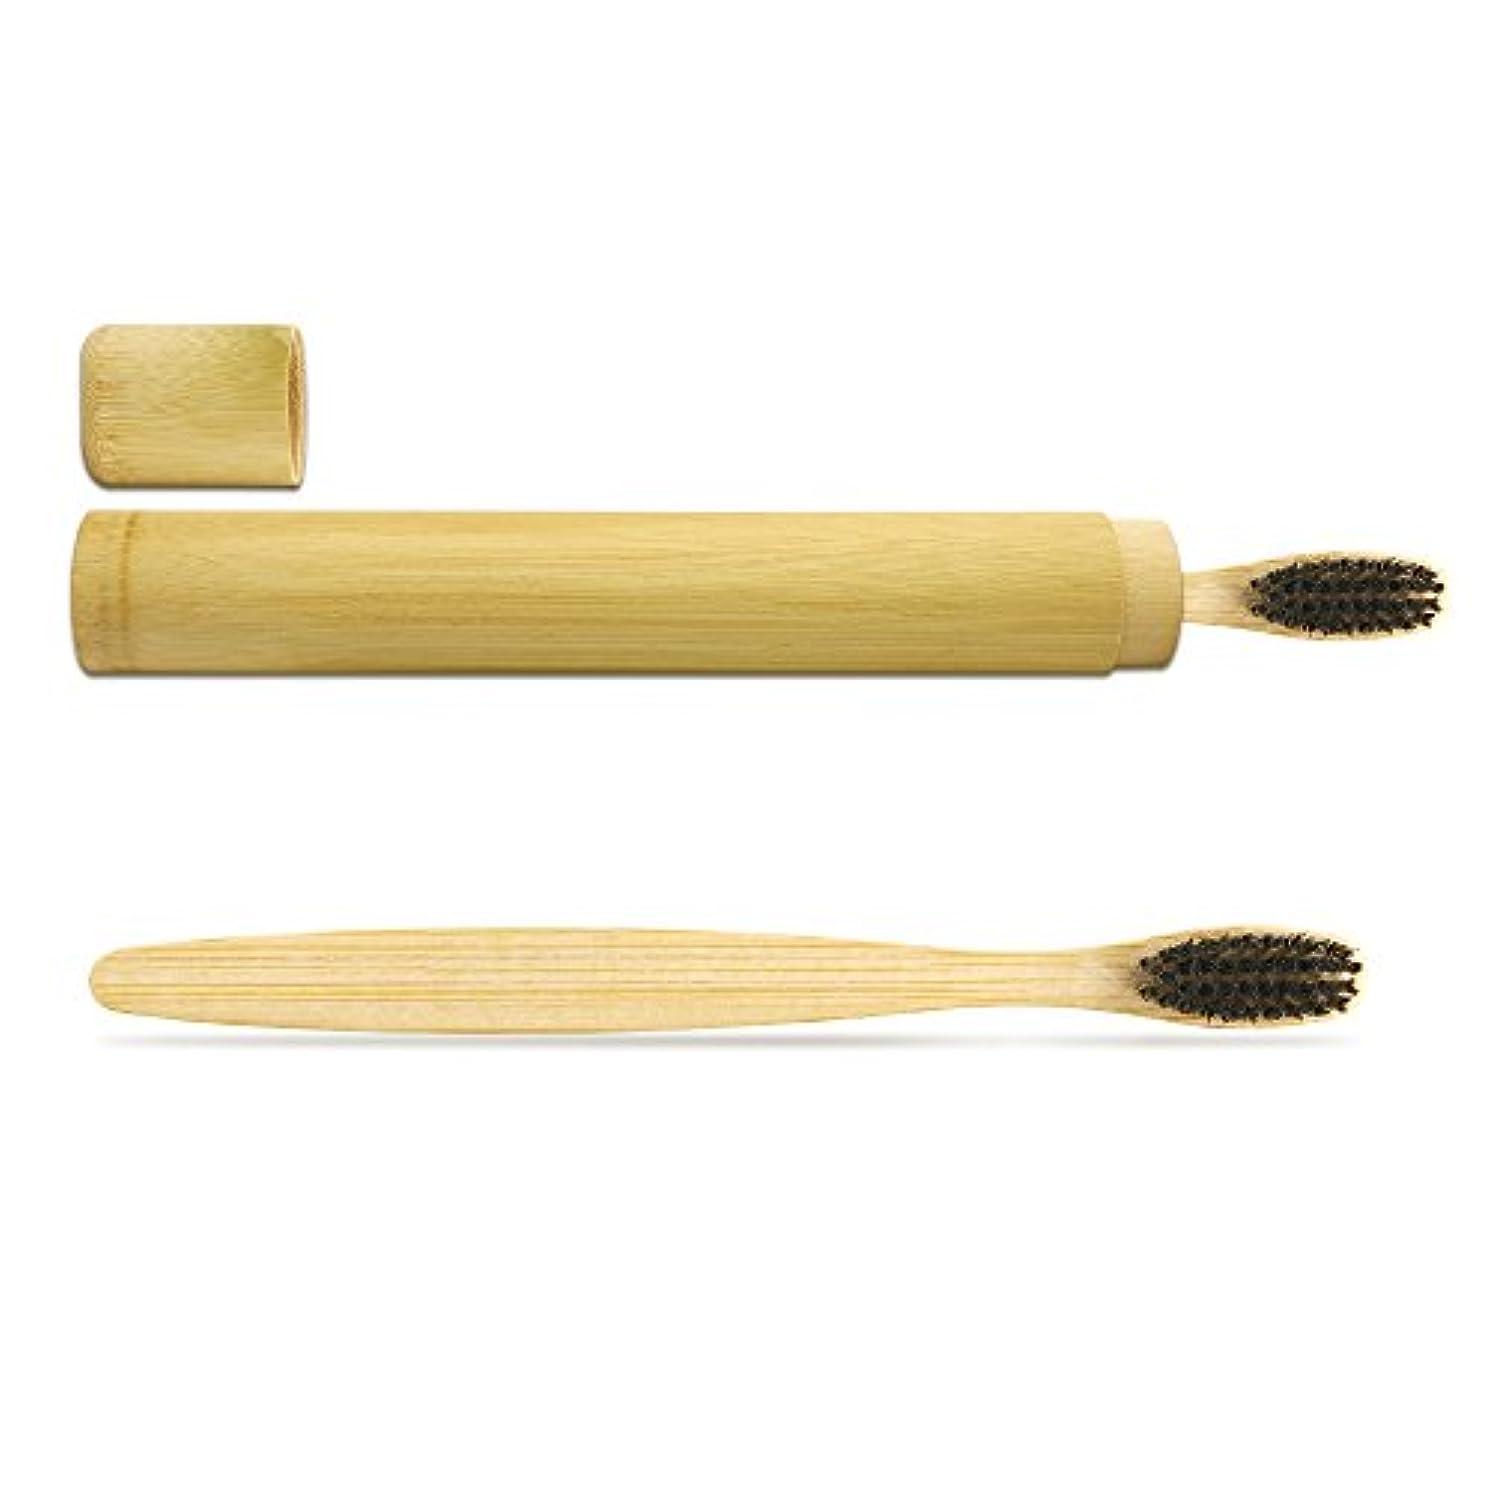 N-amboo 竹製 高耐久度 歯ブラシ ケース付き 軽量 携帯便利 出張旅行